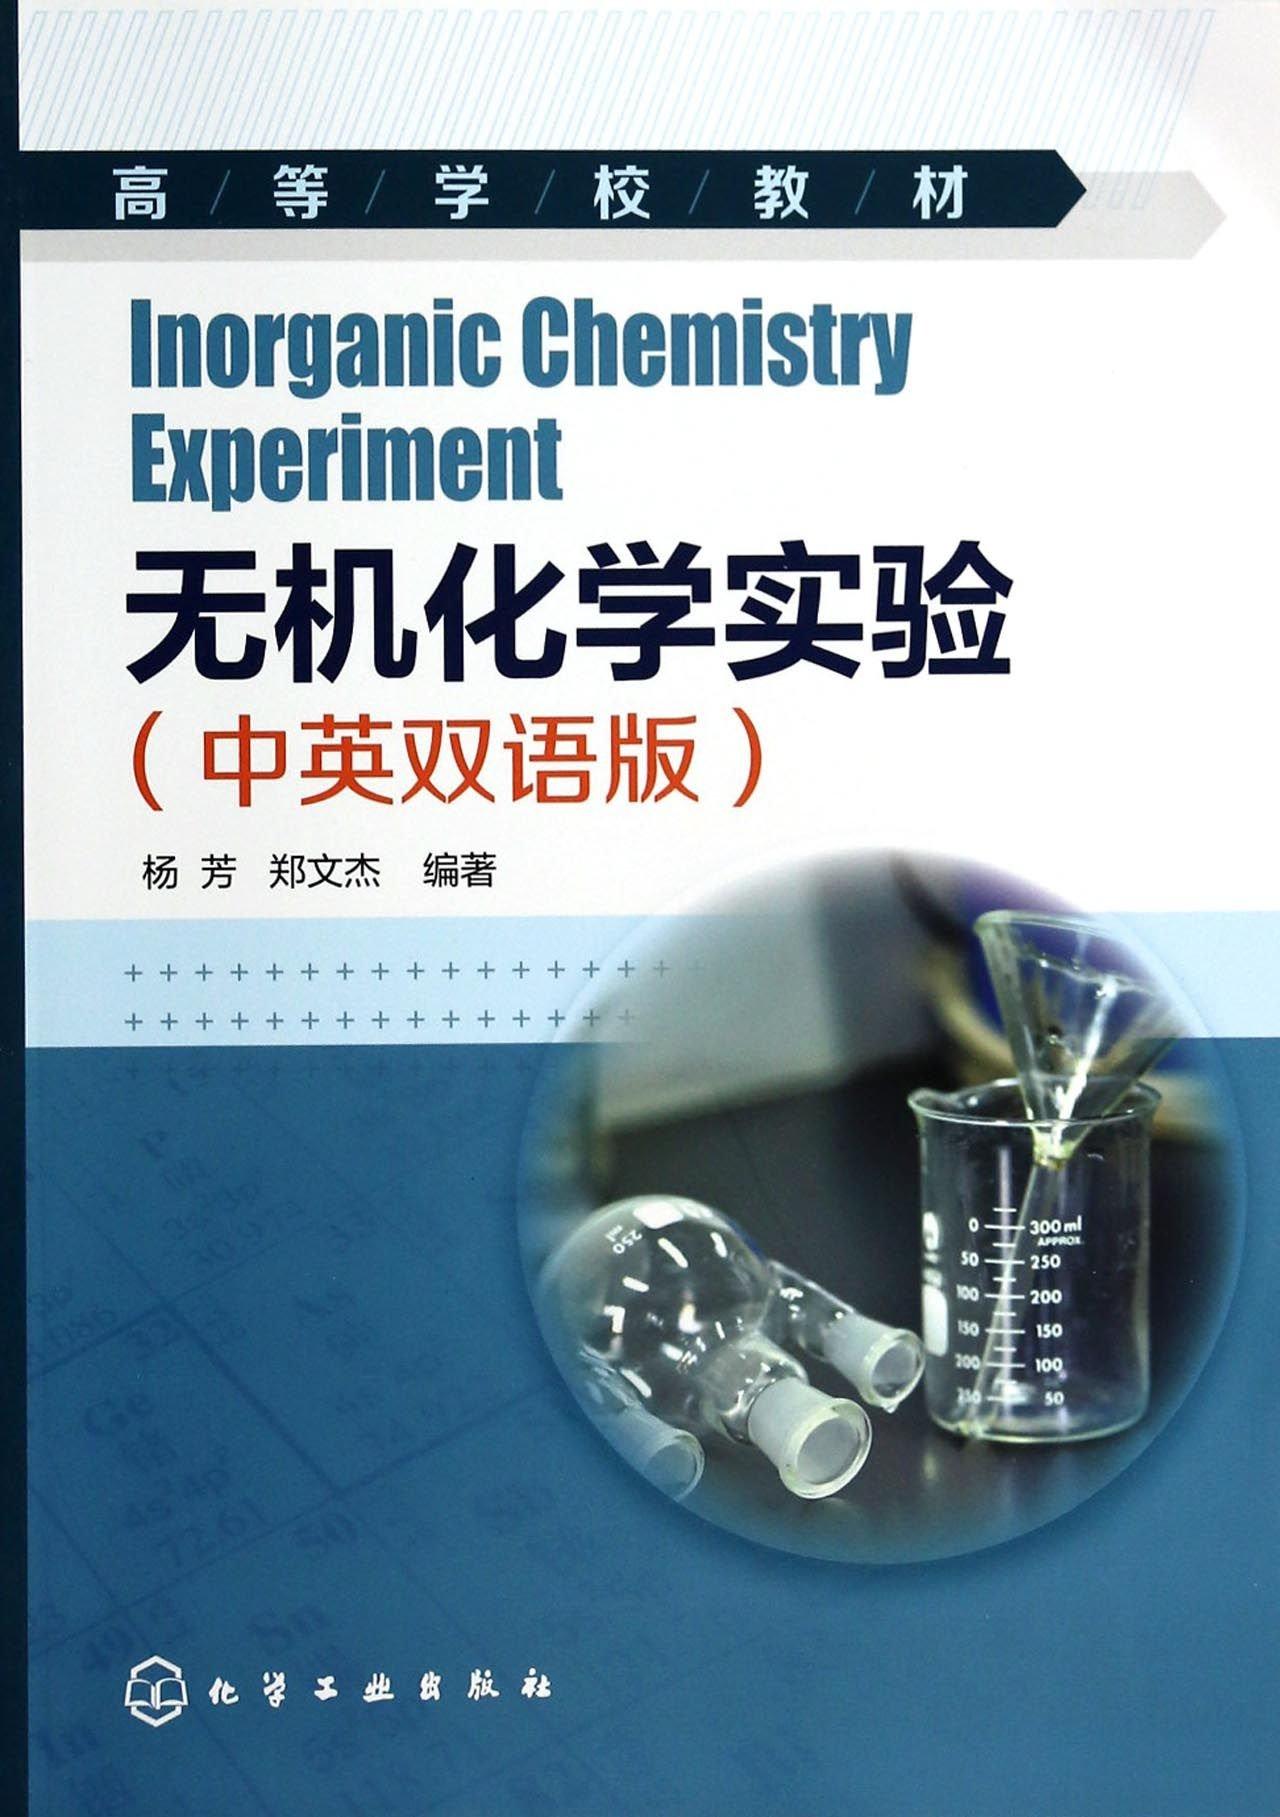 Inorganic Chemistry Experiment (Yang Fang) (bilingual edition